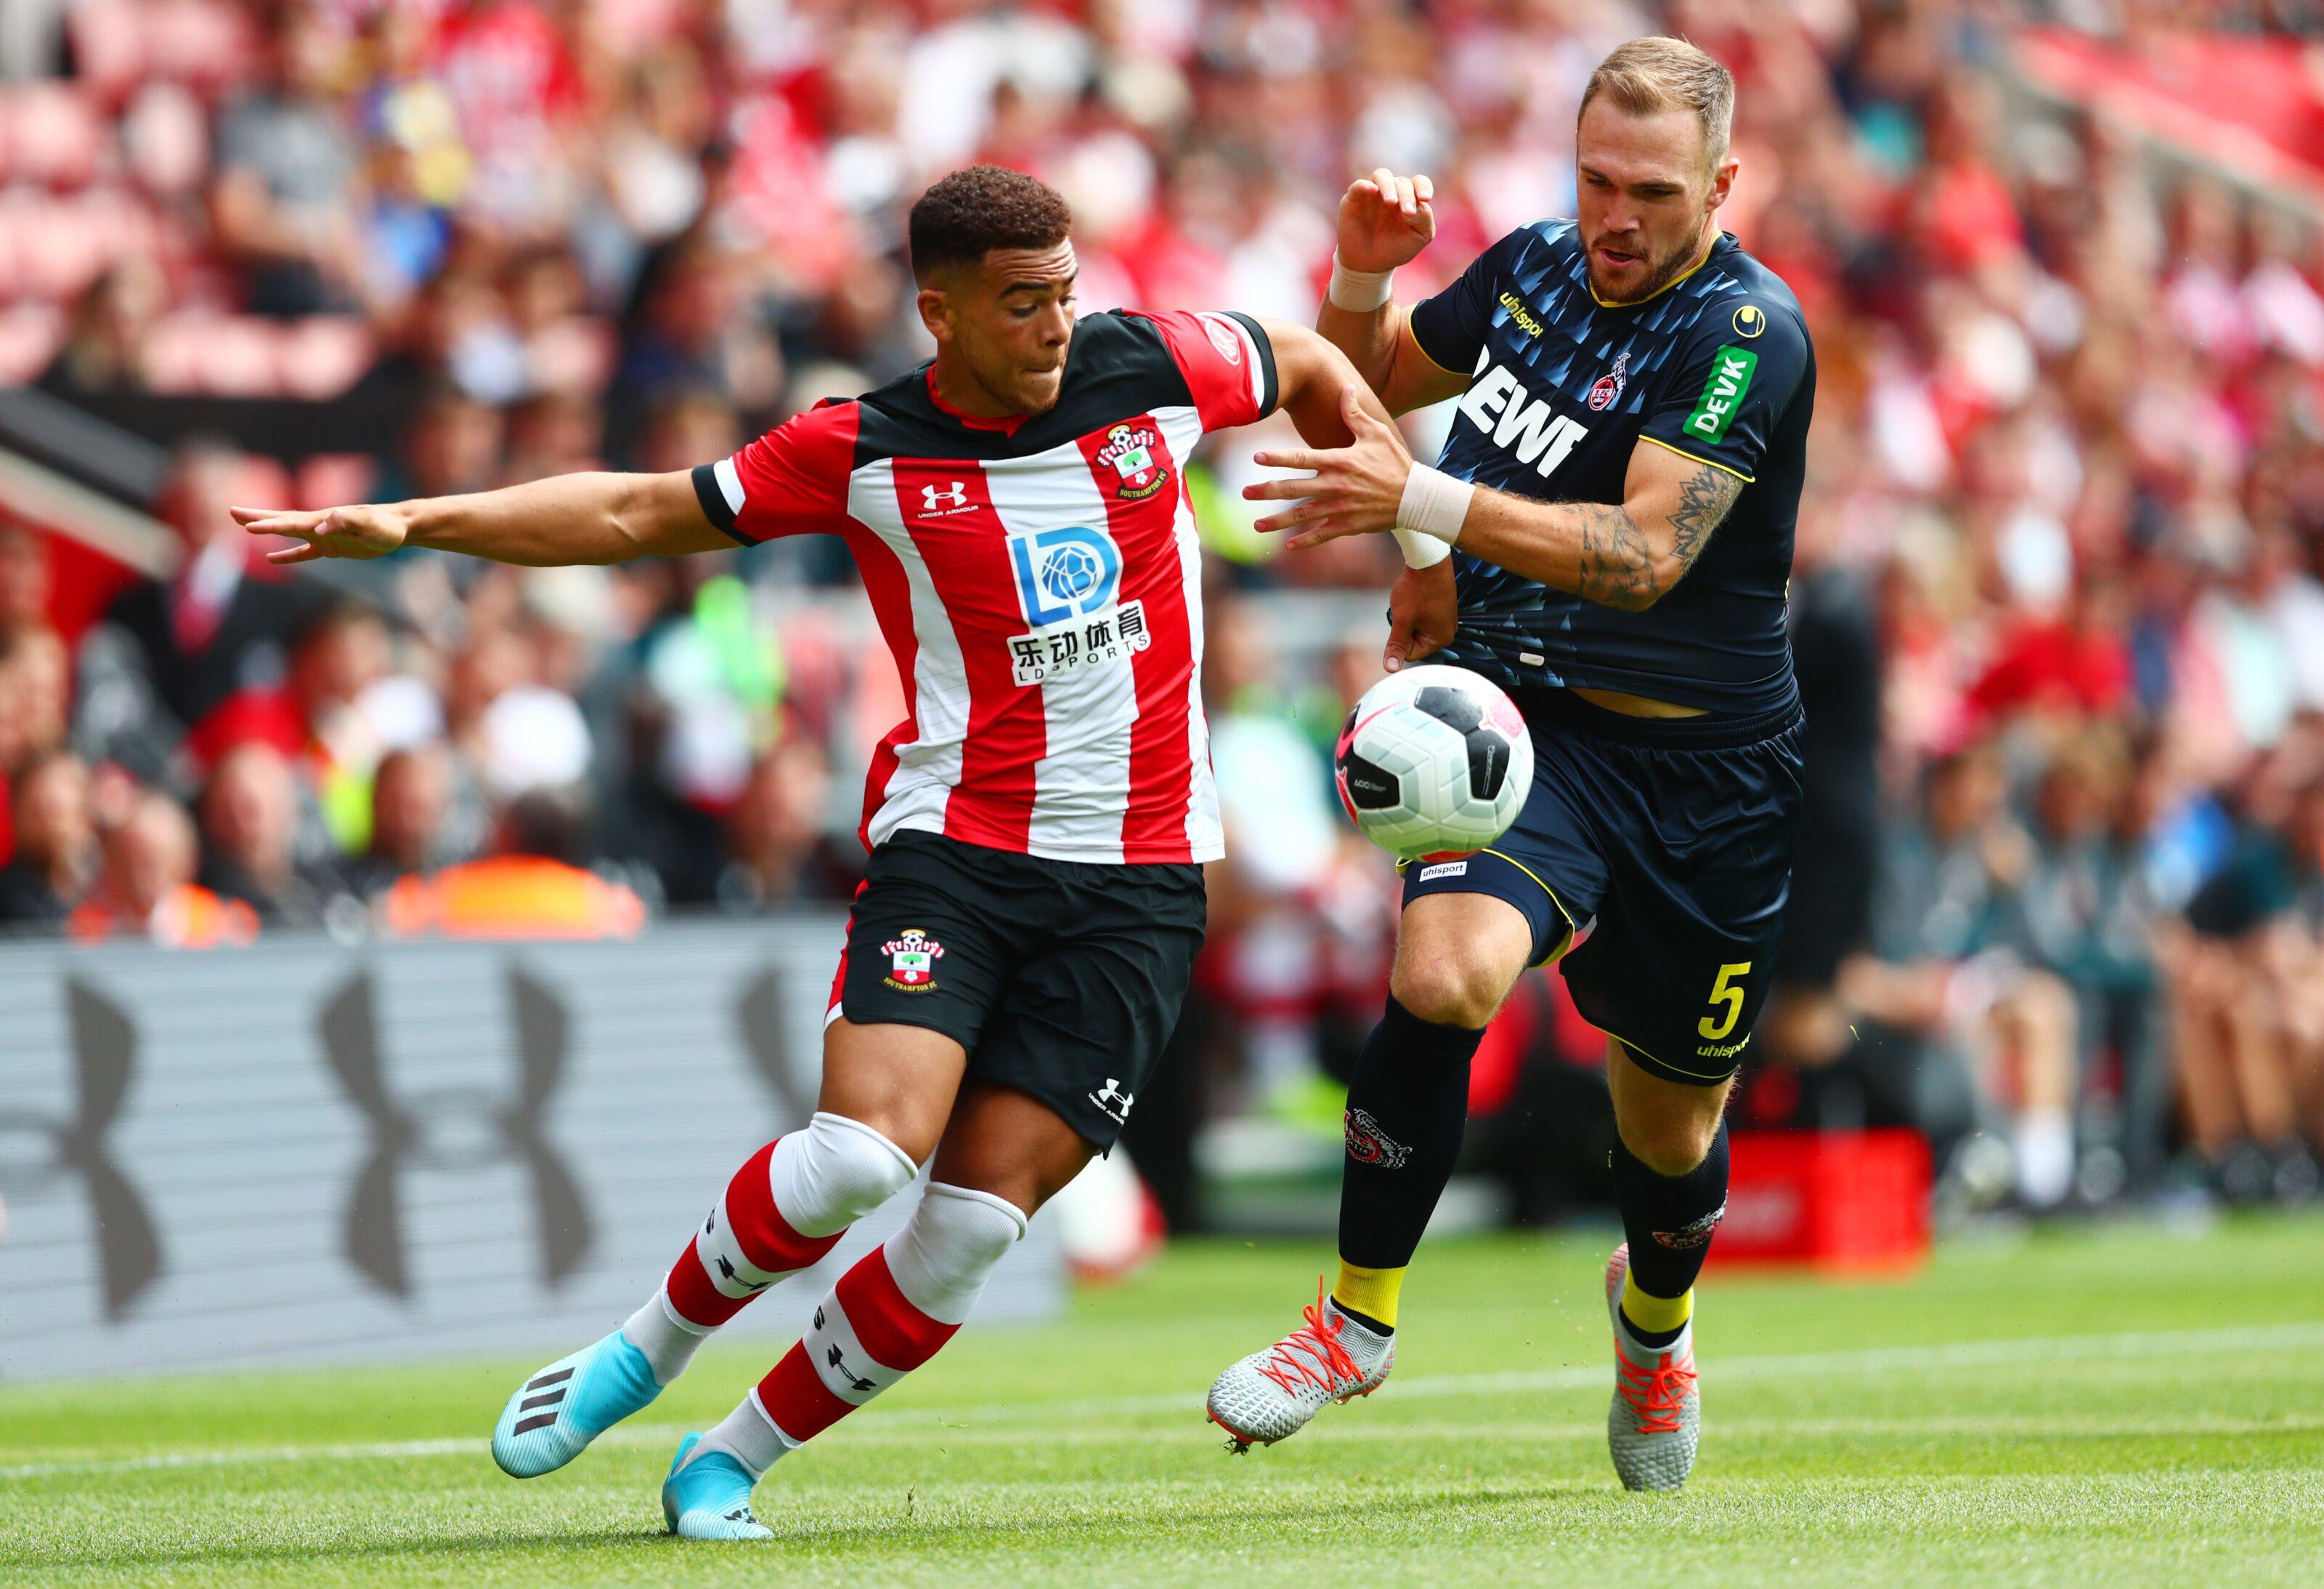 Burnley vs Southampton: Prem League – Preview and Predictions